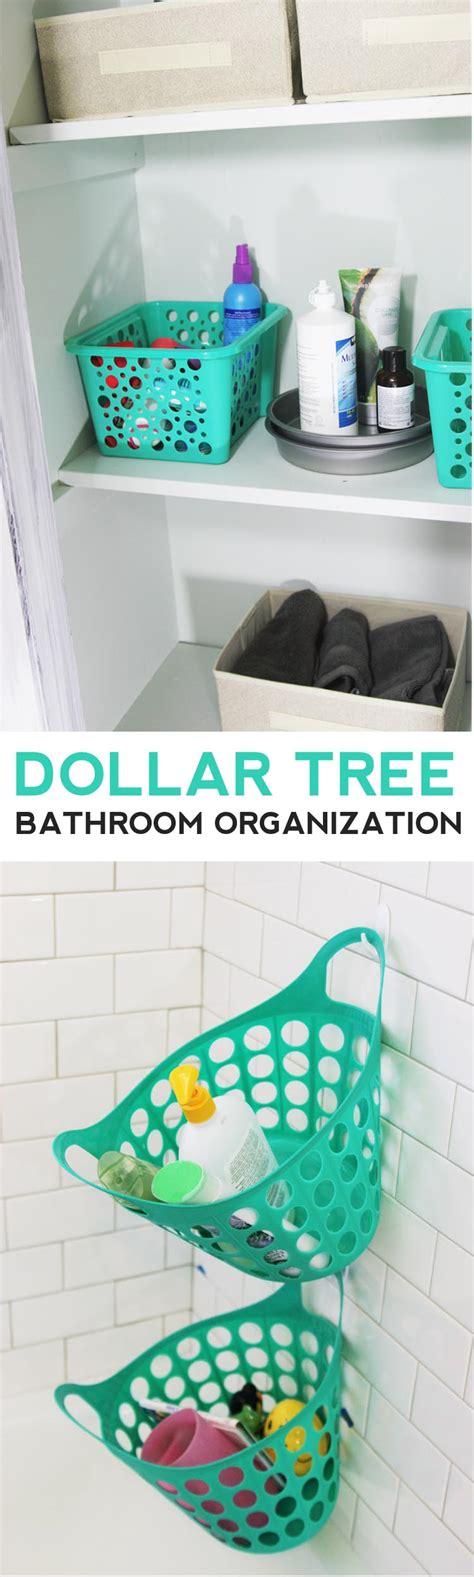 Dollar tree bathroom organization homemade ginger